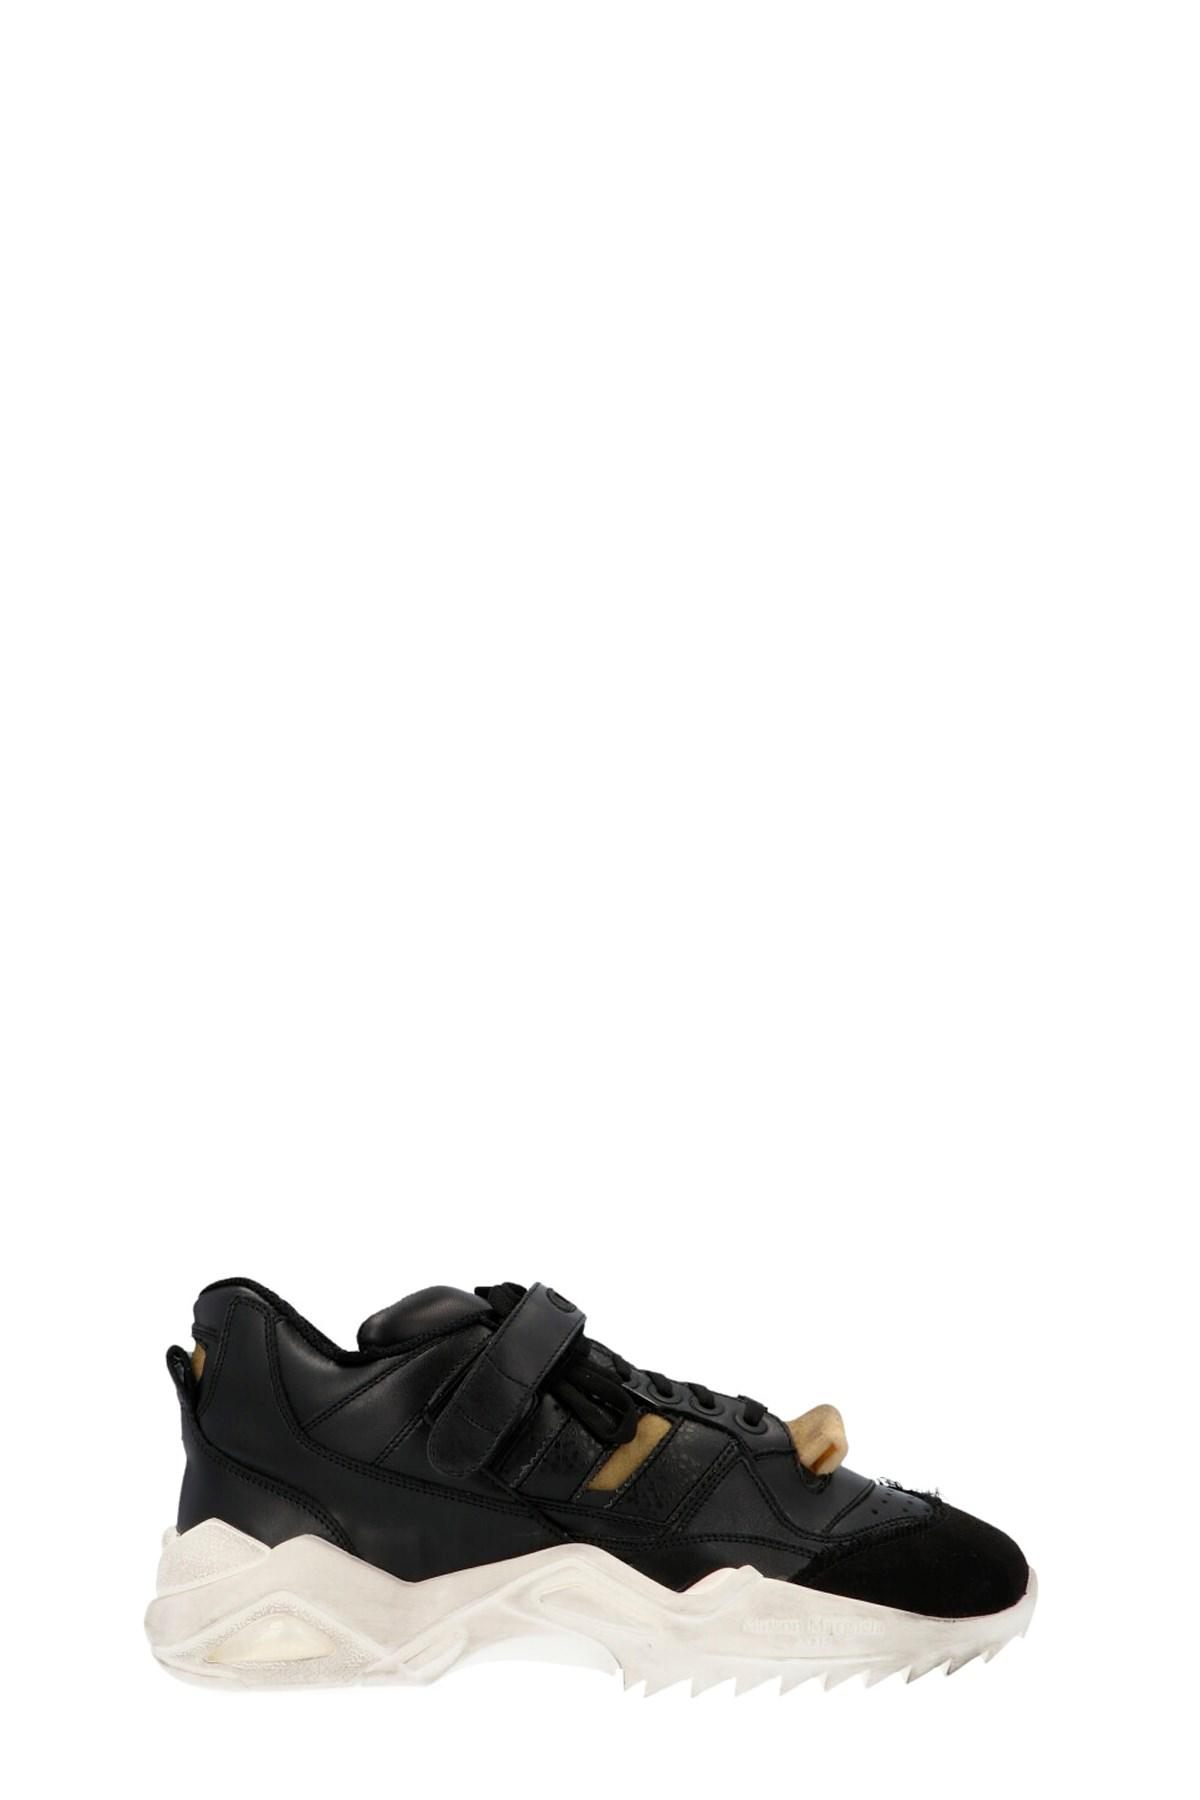 maison margiela 'New retrofit' sneakers